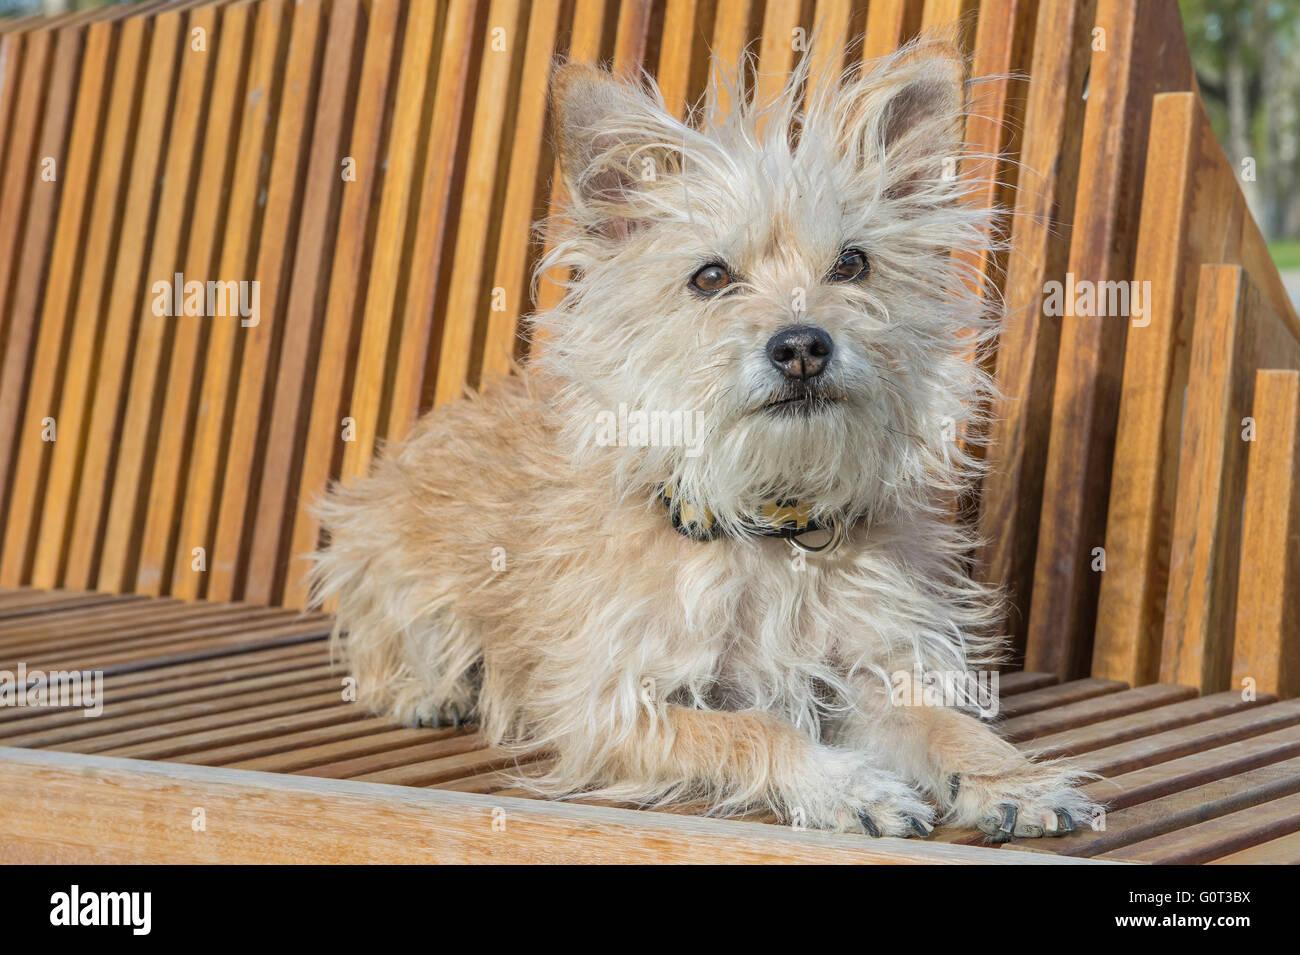 Little White Dog Portrait Poodle Chihuahua Schnauzer Mix Mixed